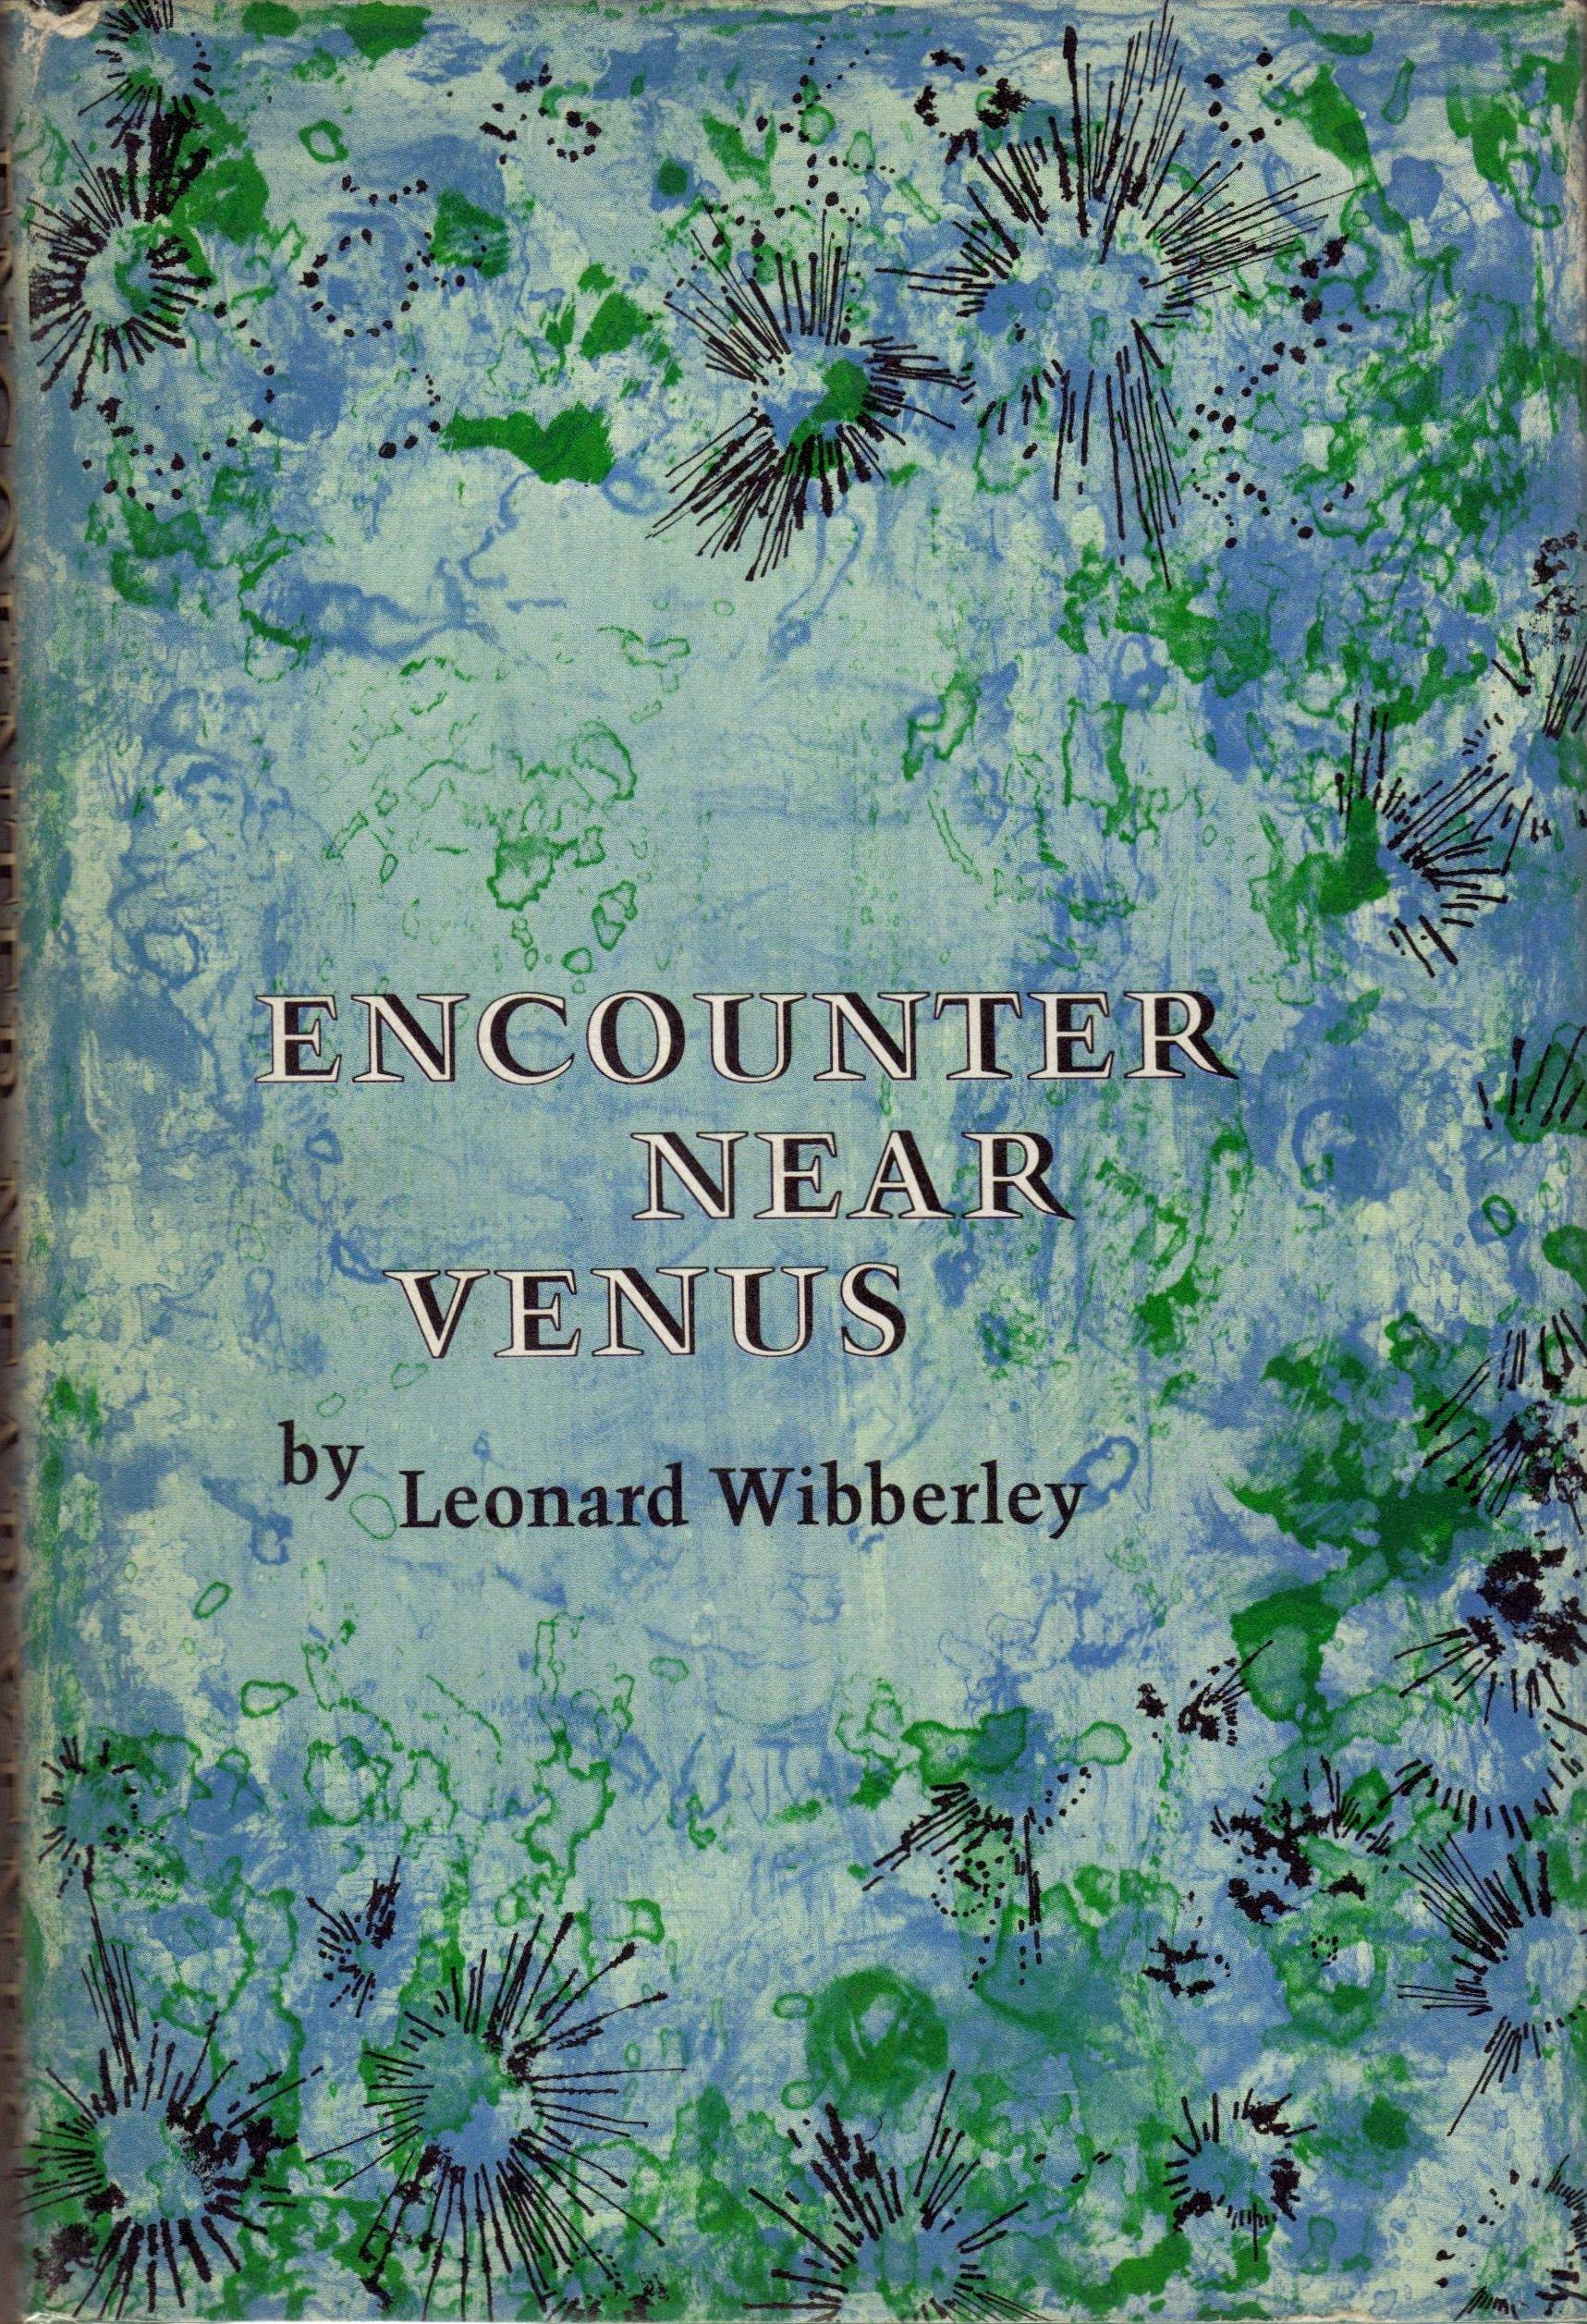 Encounter Near Venus, Wibberley, Leonard & Wadowski-Bak, Alice